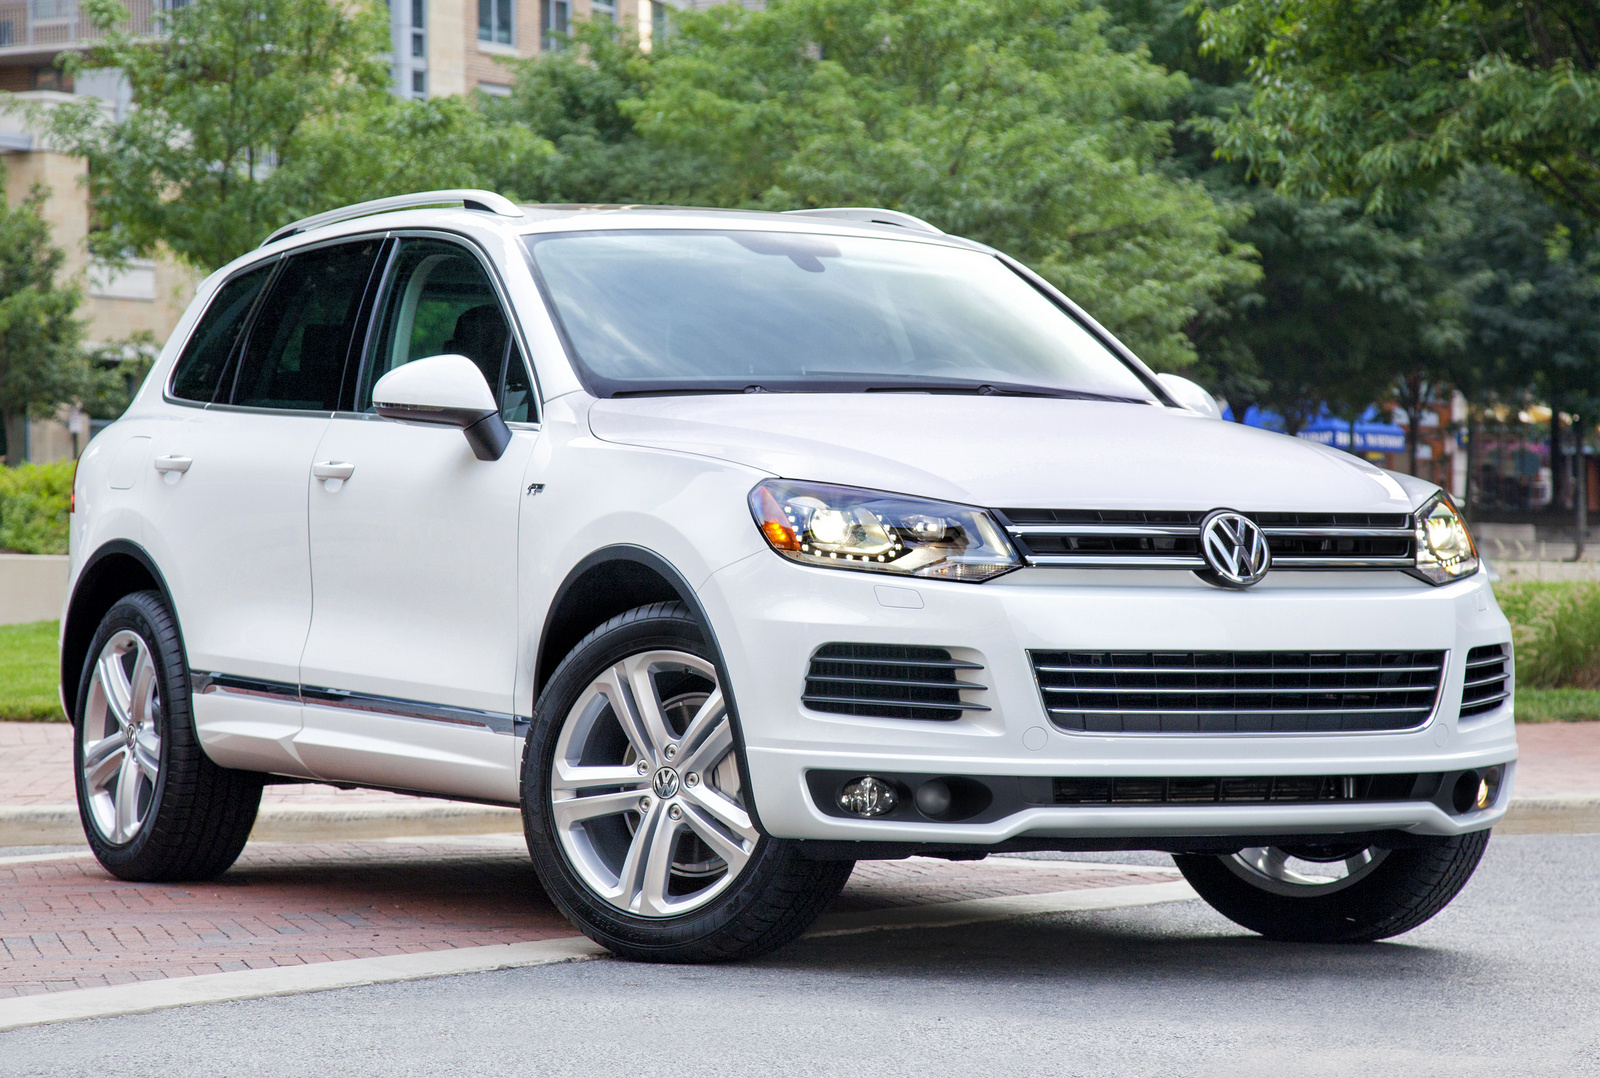 2014 Volkswagen Touareg Review Cargurus